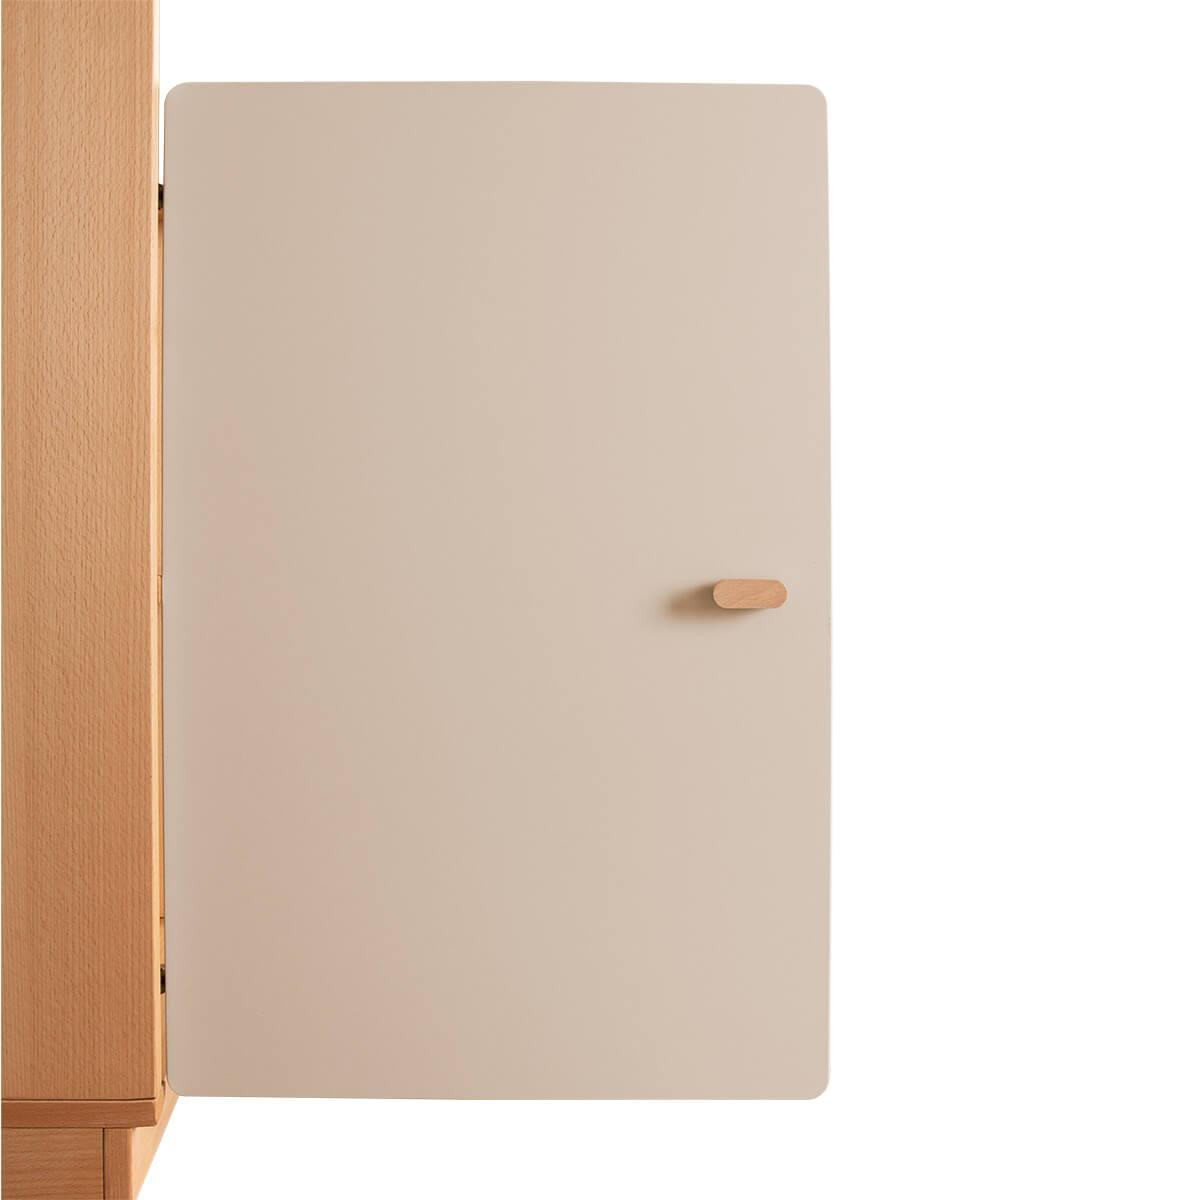 Schranktür 2/5 70cm-Griff DESTYLE de Breuyn MDF hellgrau-lackiert